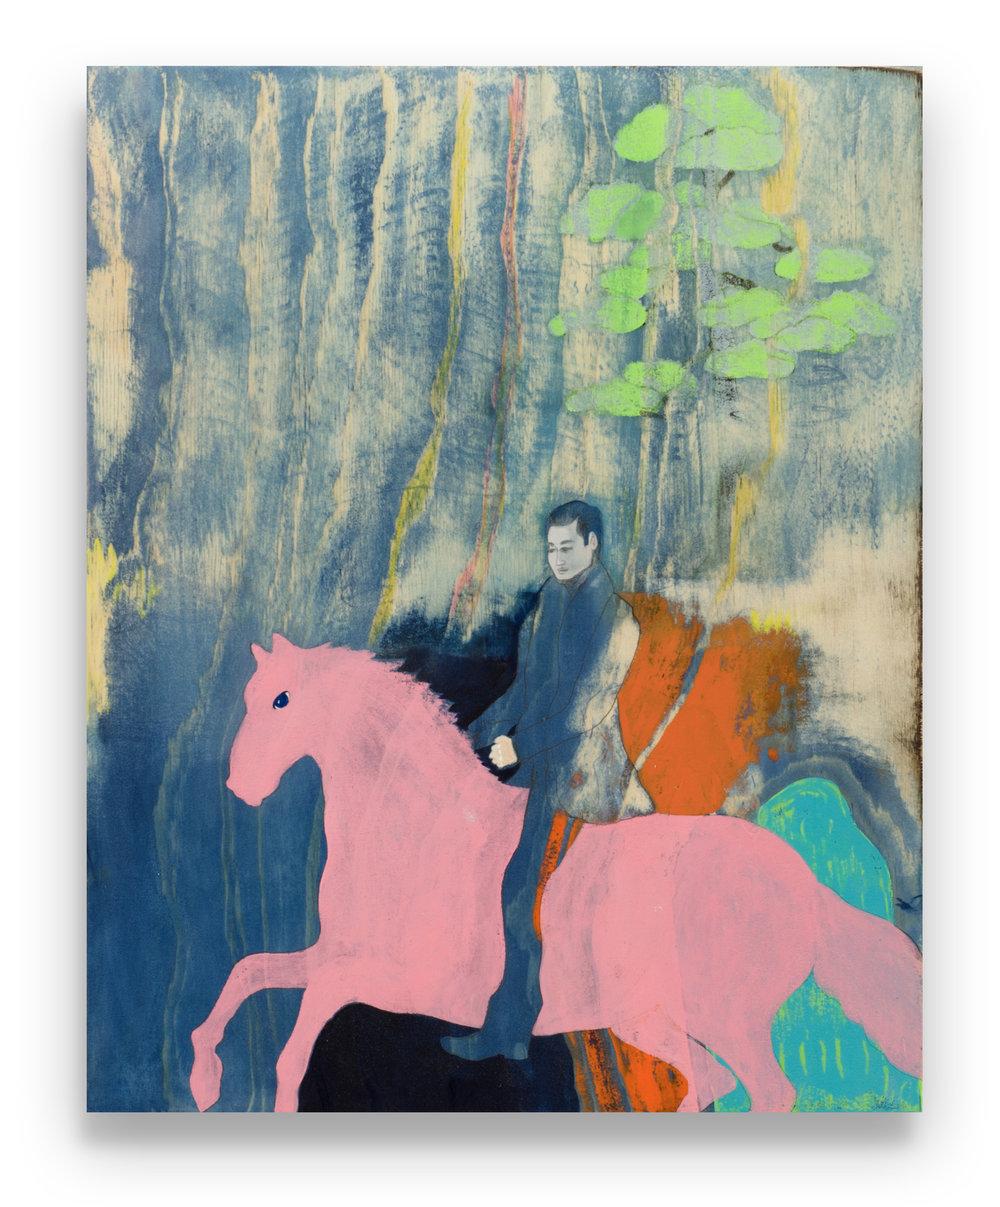 Rider (2017) Acrylic, graphite, pigment ink on board. 50 x 40cm